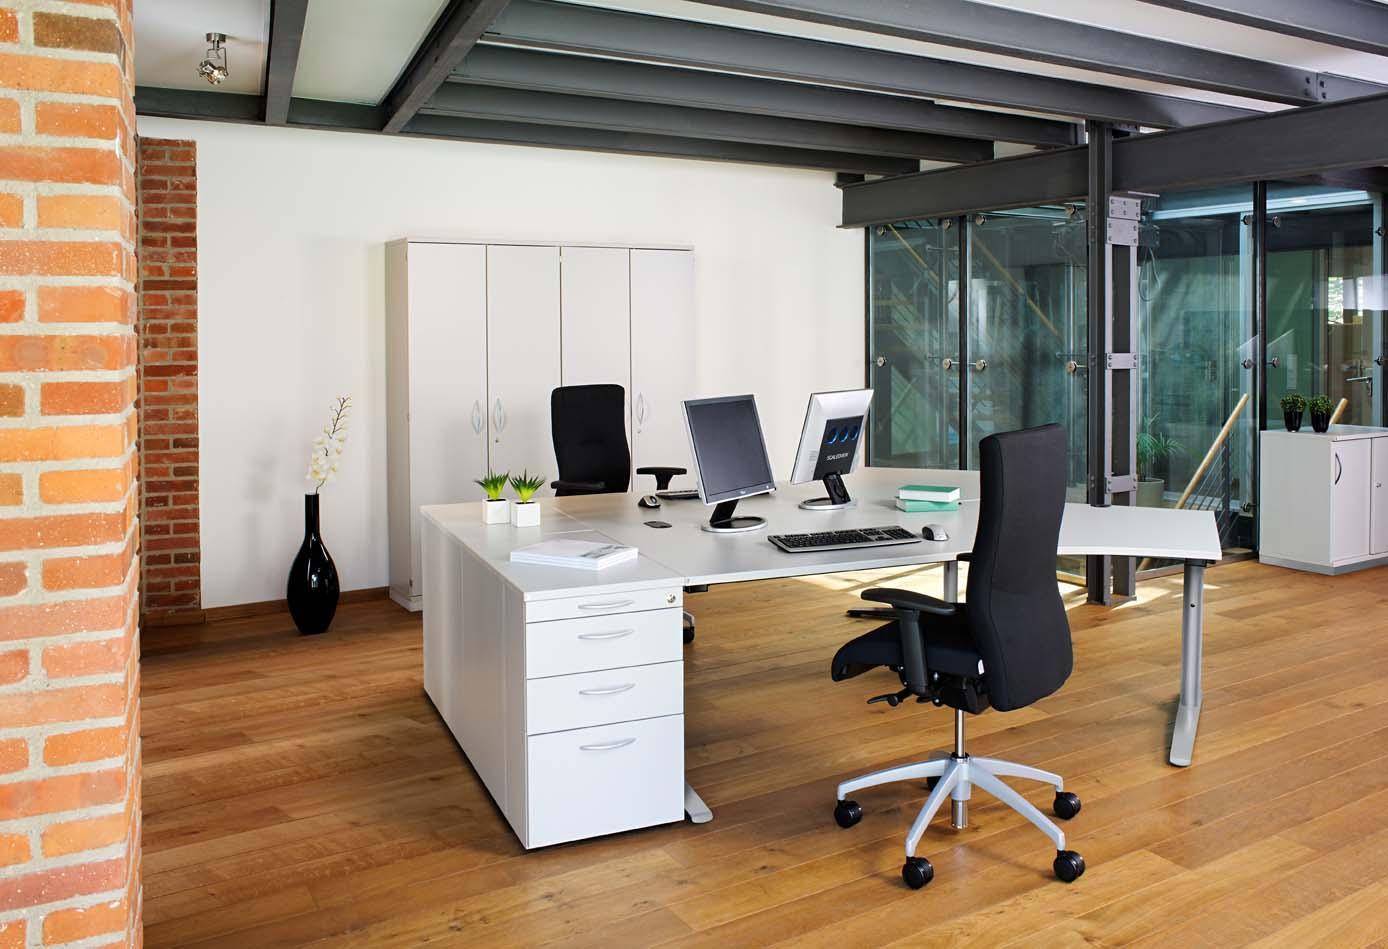 SAX - Büro, Büroeinrichtung, Büromöbel-Systeme, \